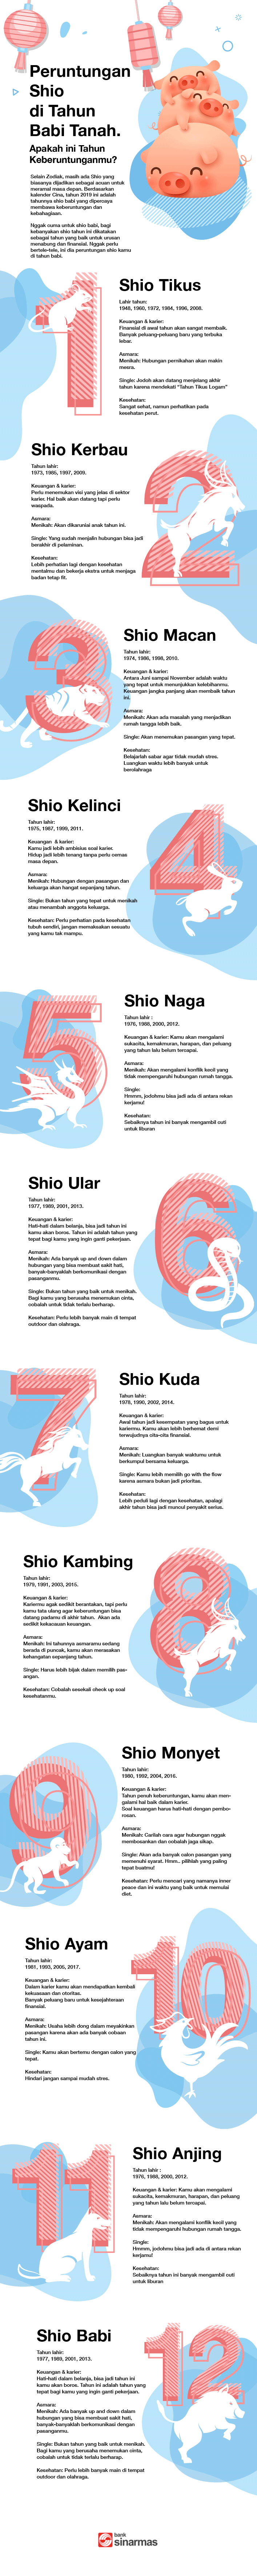 infografik-shio